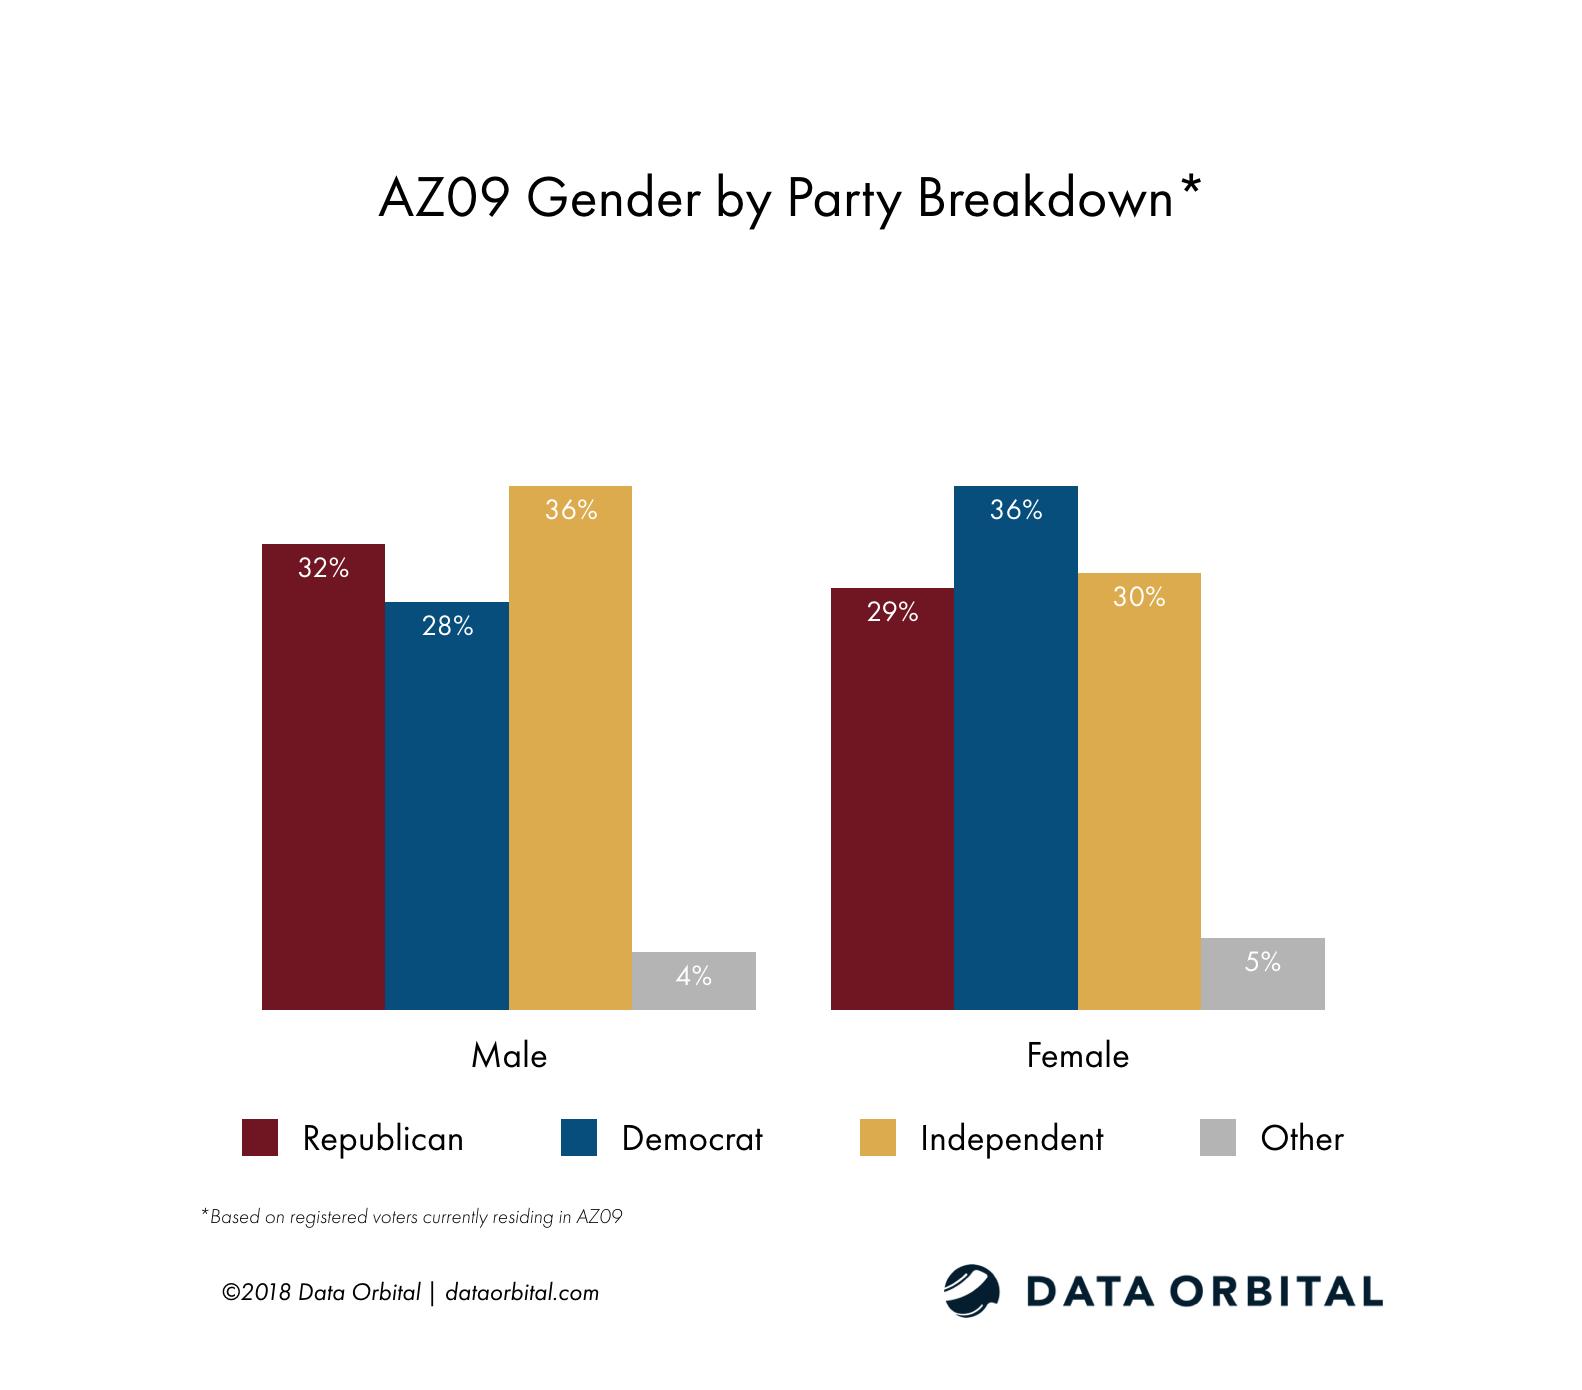 AZ09 District Profile Gender by Party Registration Breakdown